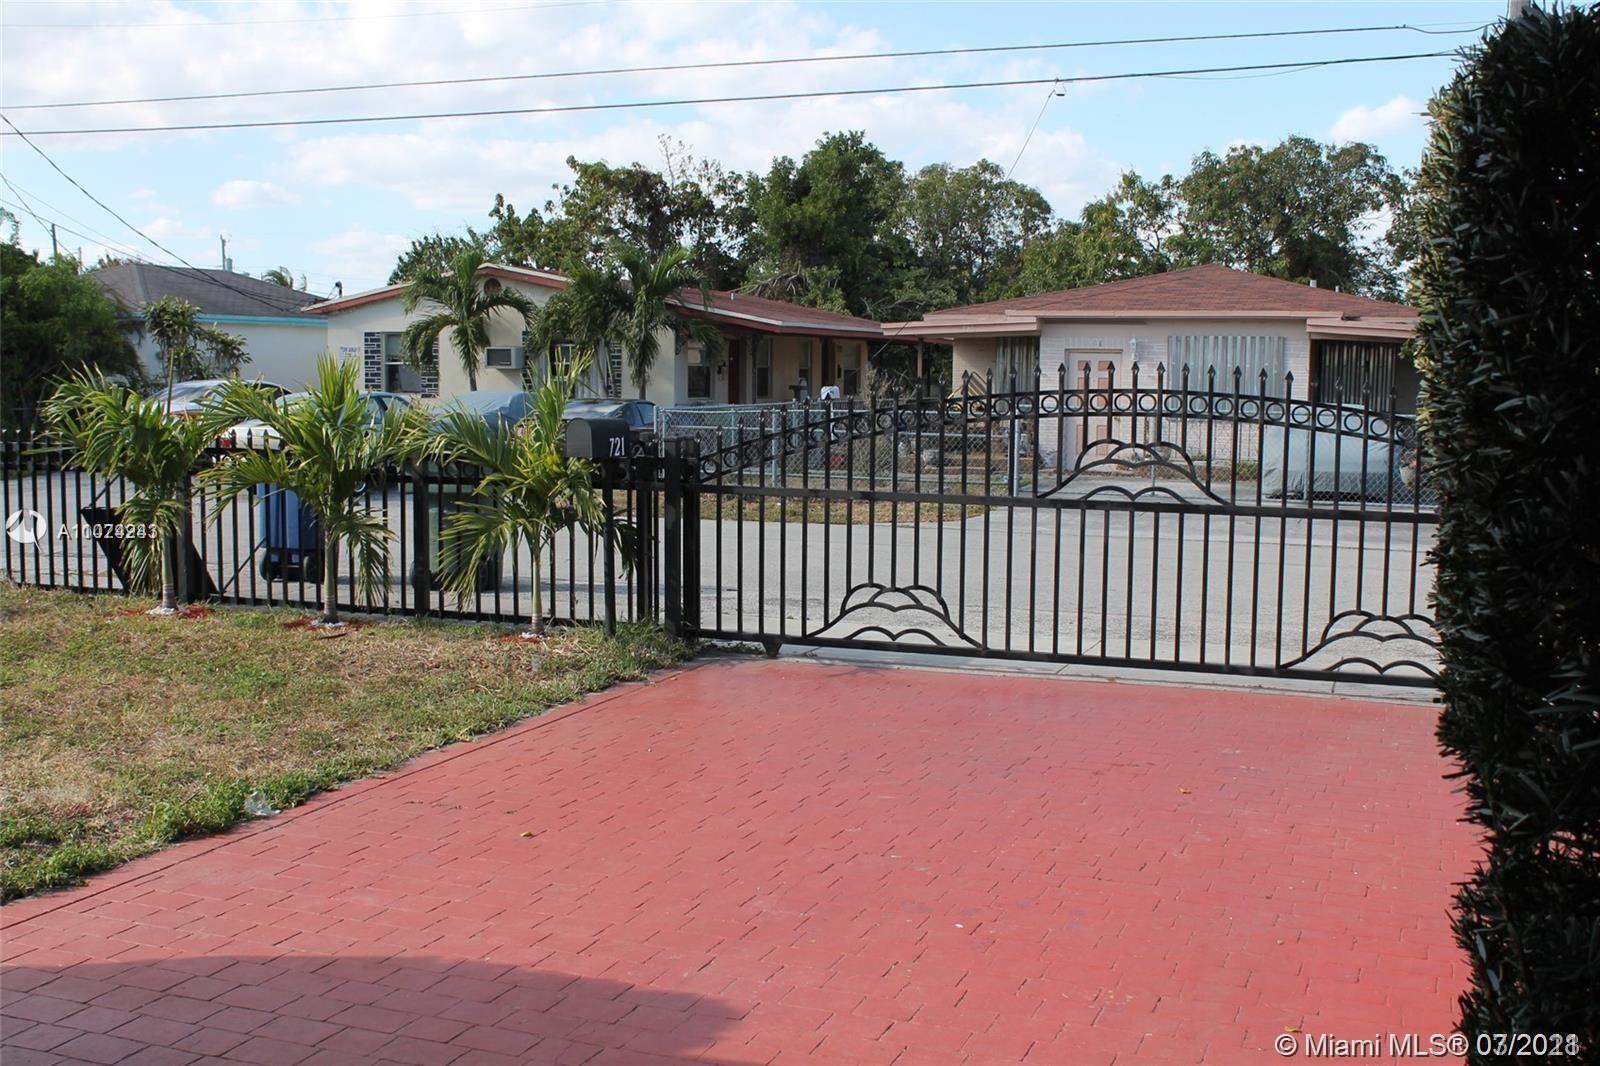 Photo of 721 NW 6th St, Hallandale Beach, FL 33009 (MLS # A11074243)